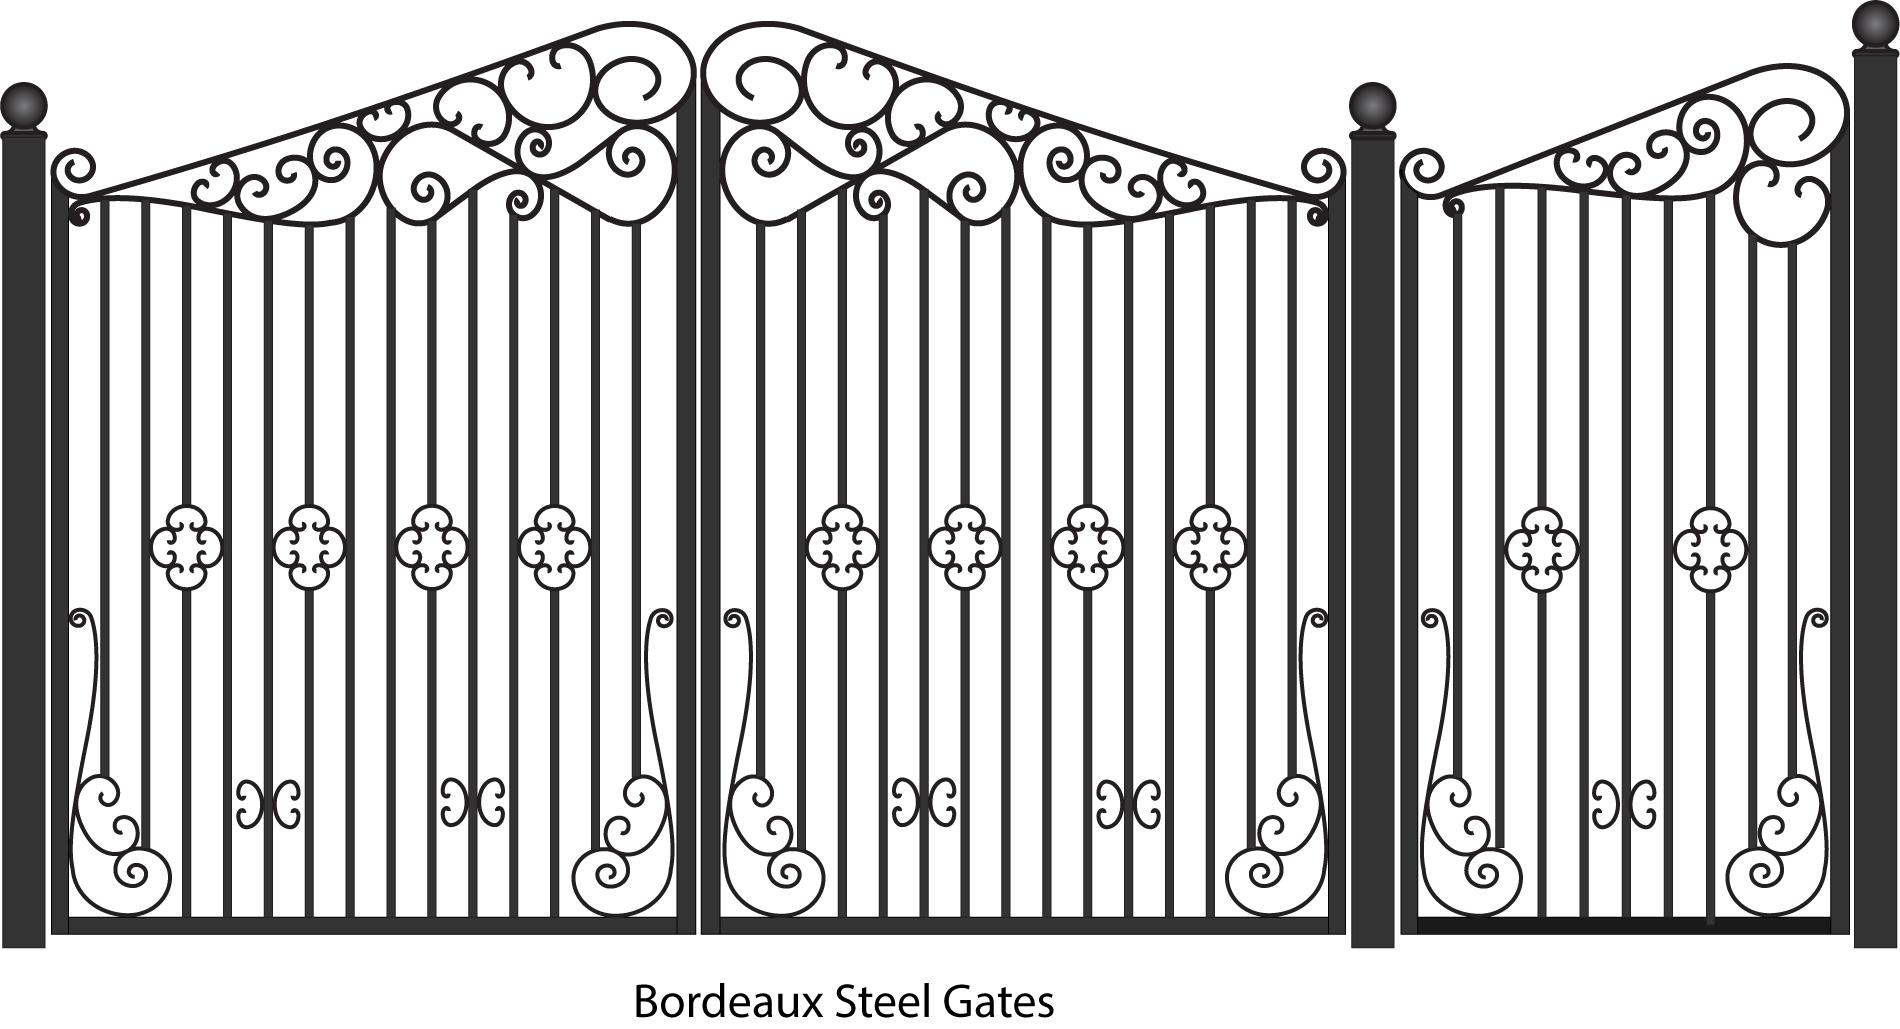 Bordeau Steel Driveway And Pedestrian Entreance Gates With Scrolls Wrought Iron Gates Steel Gate Steel Gate Design